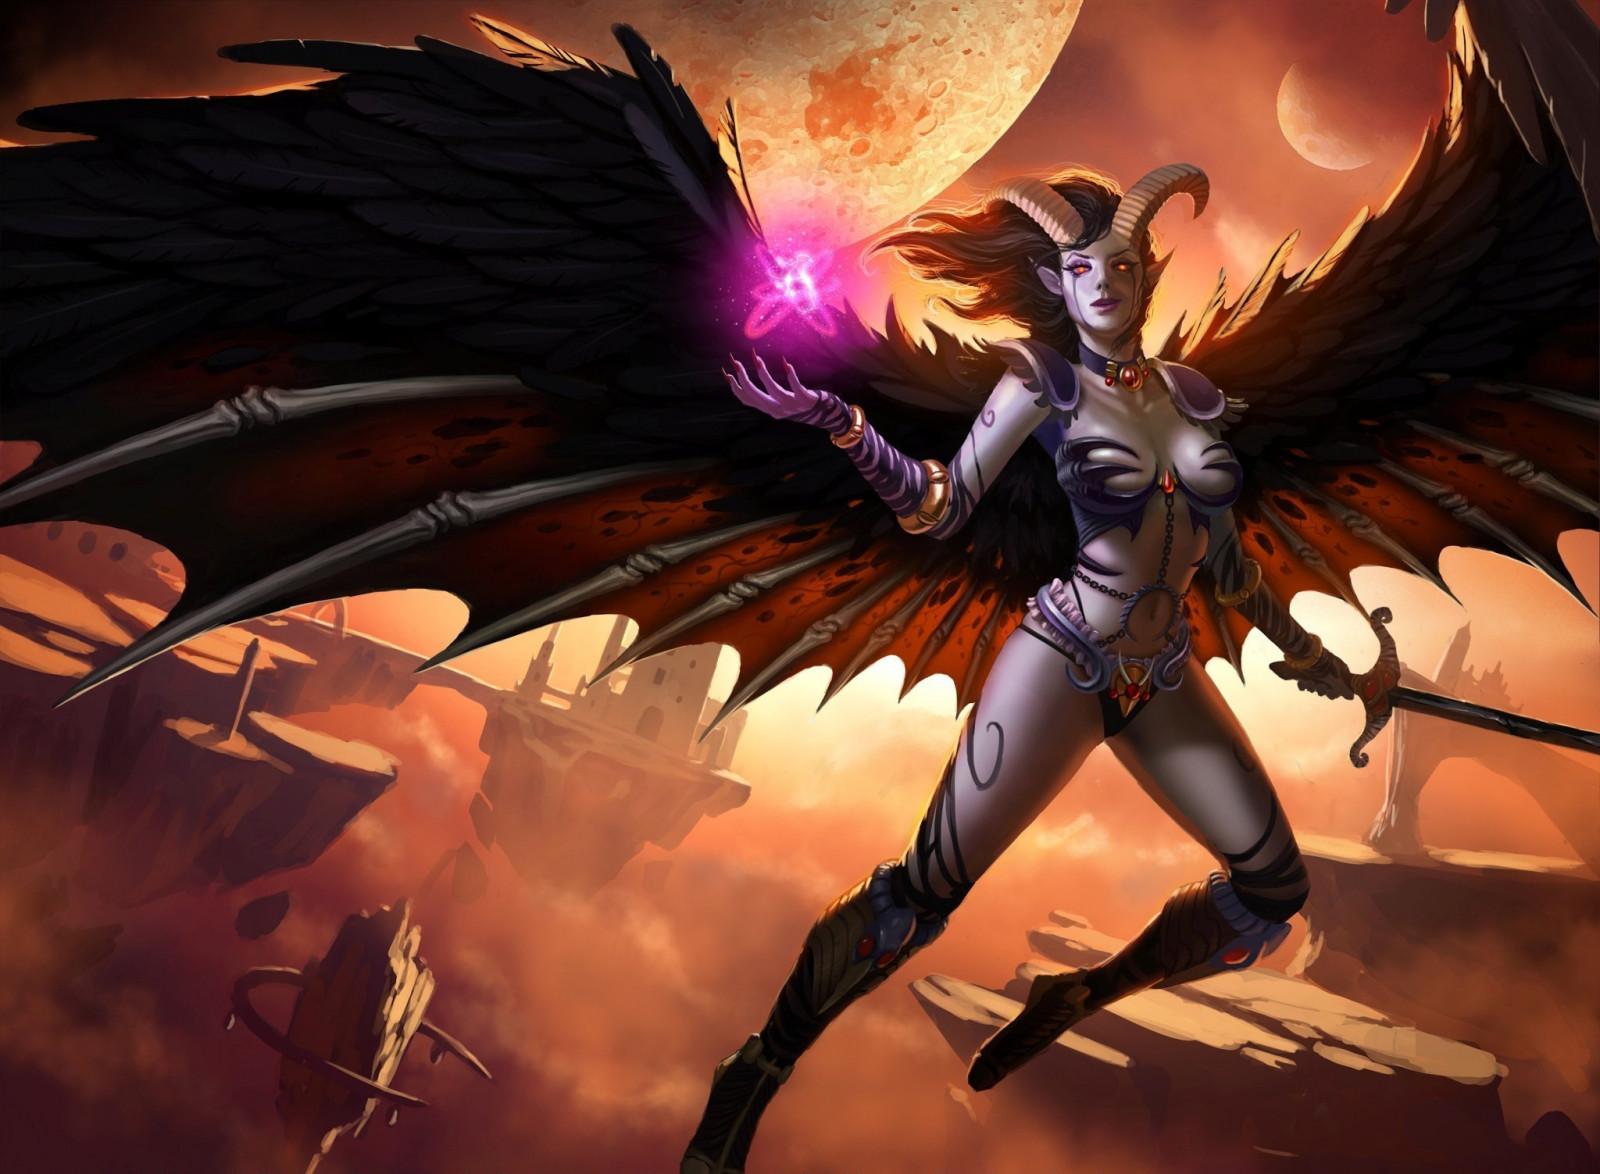 Wallpaper Illustration Fantasy Art Anime Wings Magic